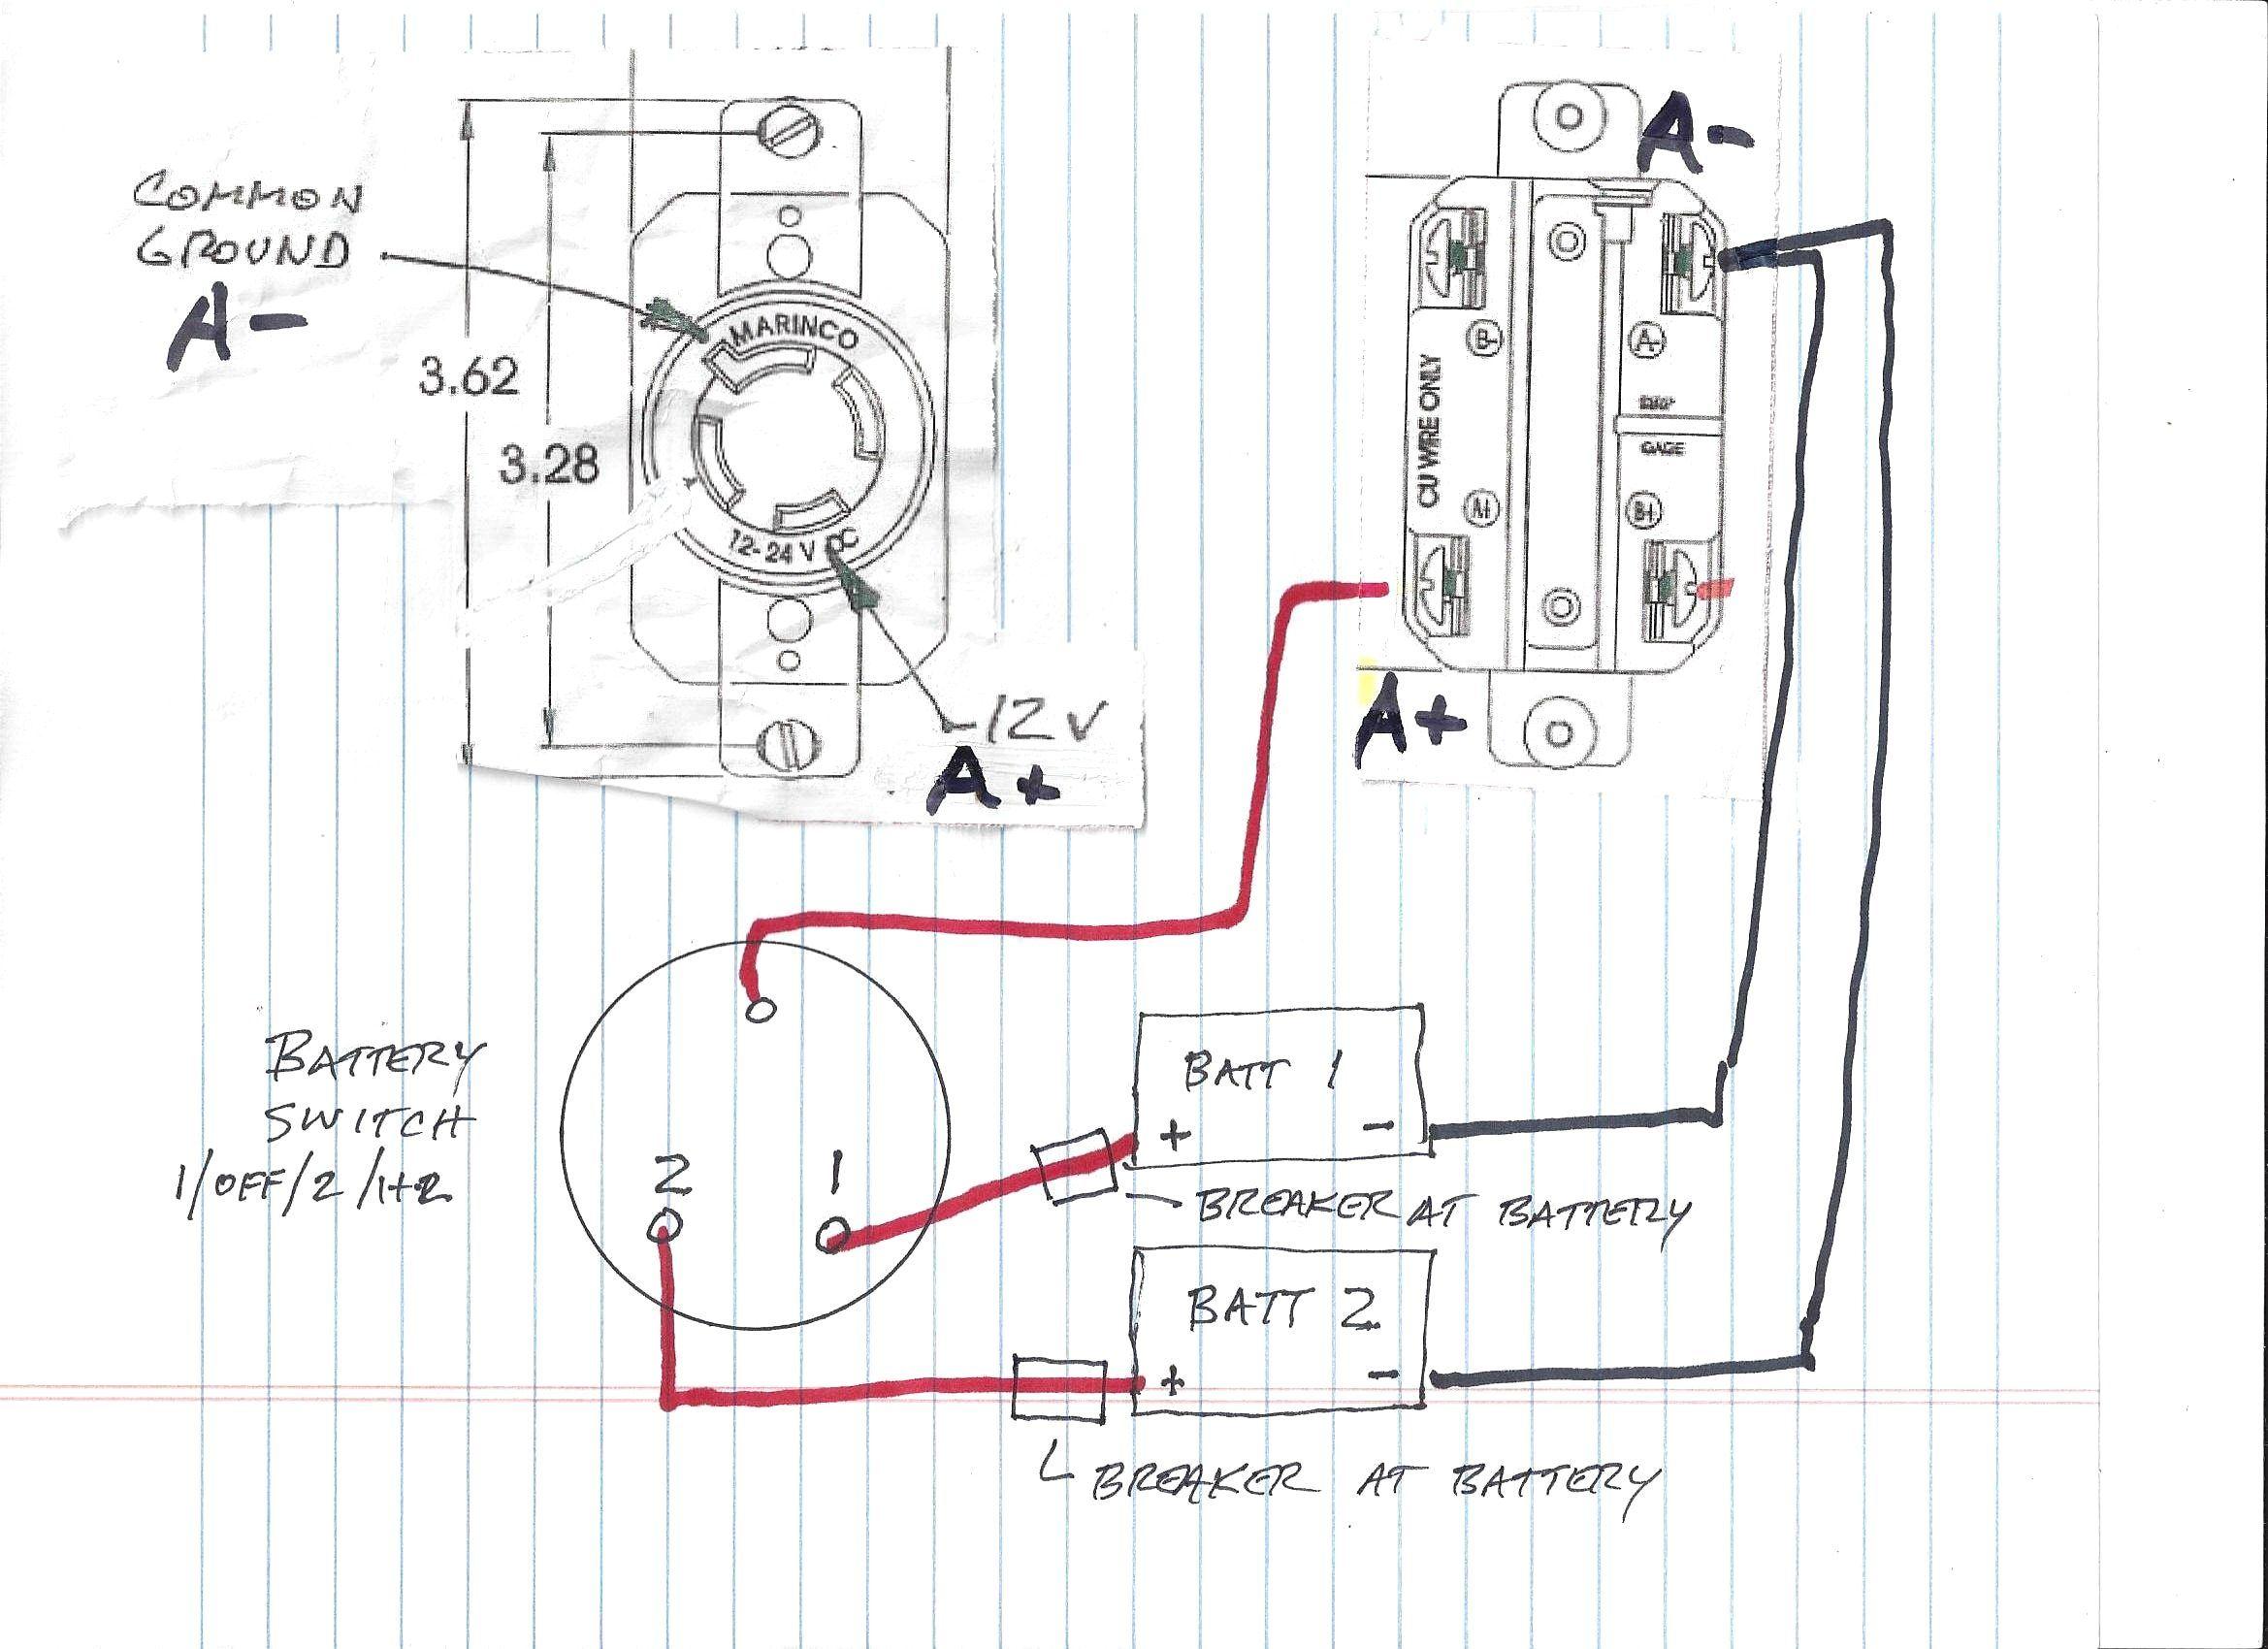 Marinco Plug Wiring Diagram Best Of 4 Prong Trolling Motor New 2 Trolling Motor Outboard Boat Motors Minn Kota